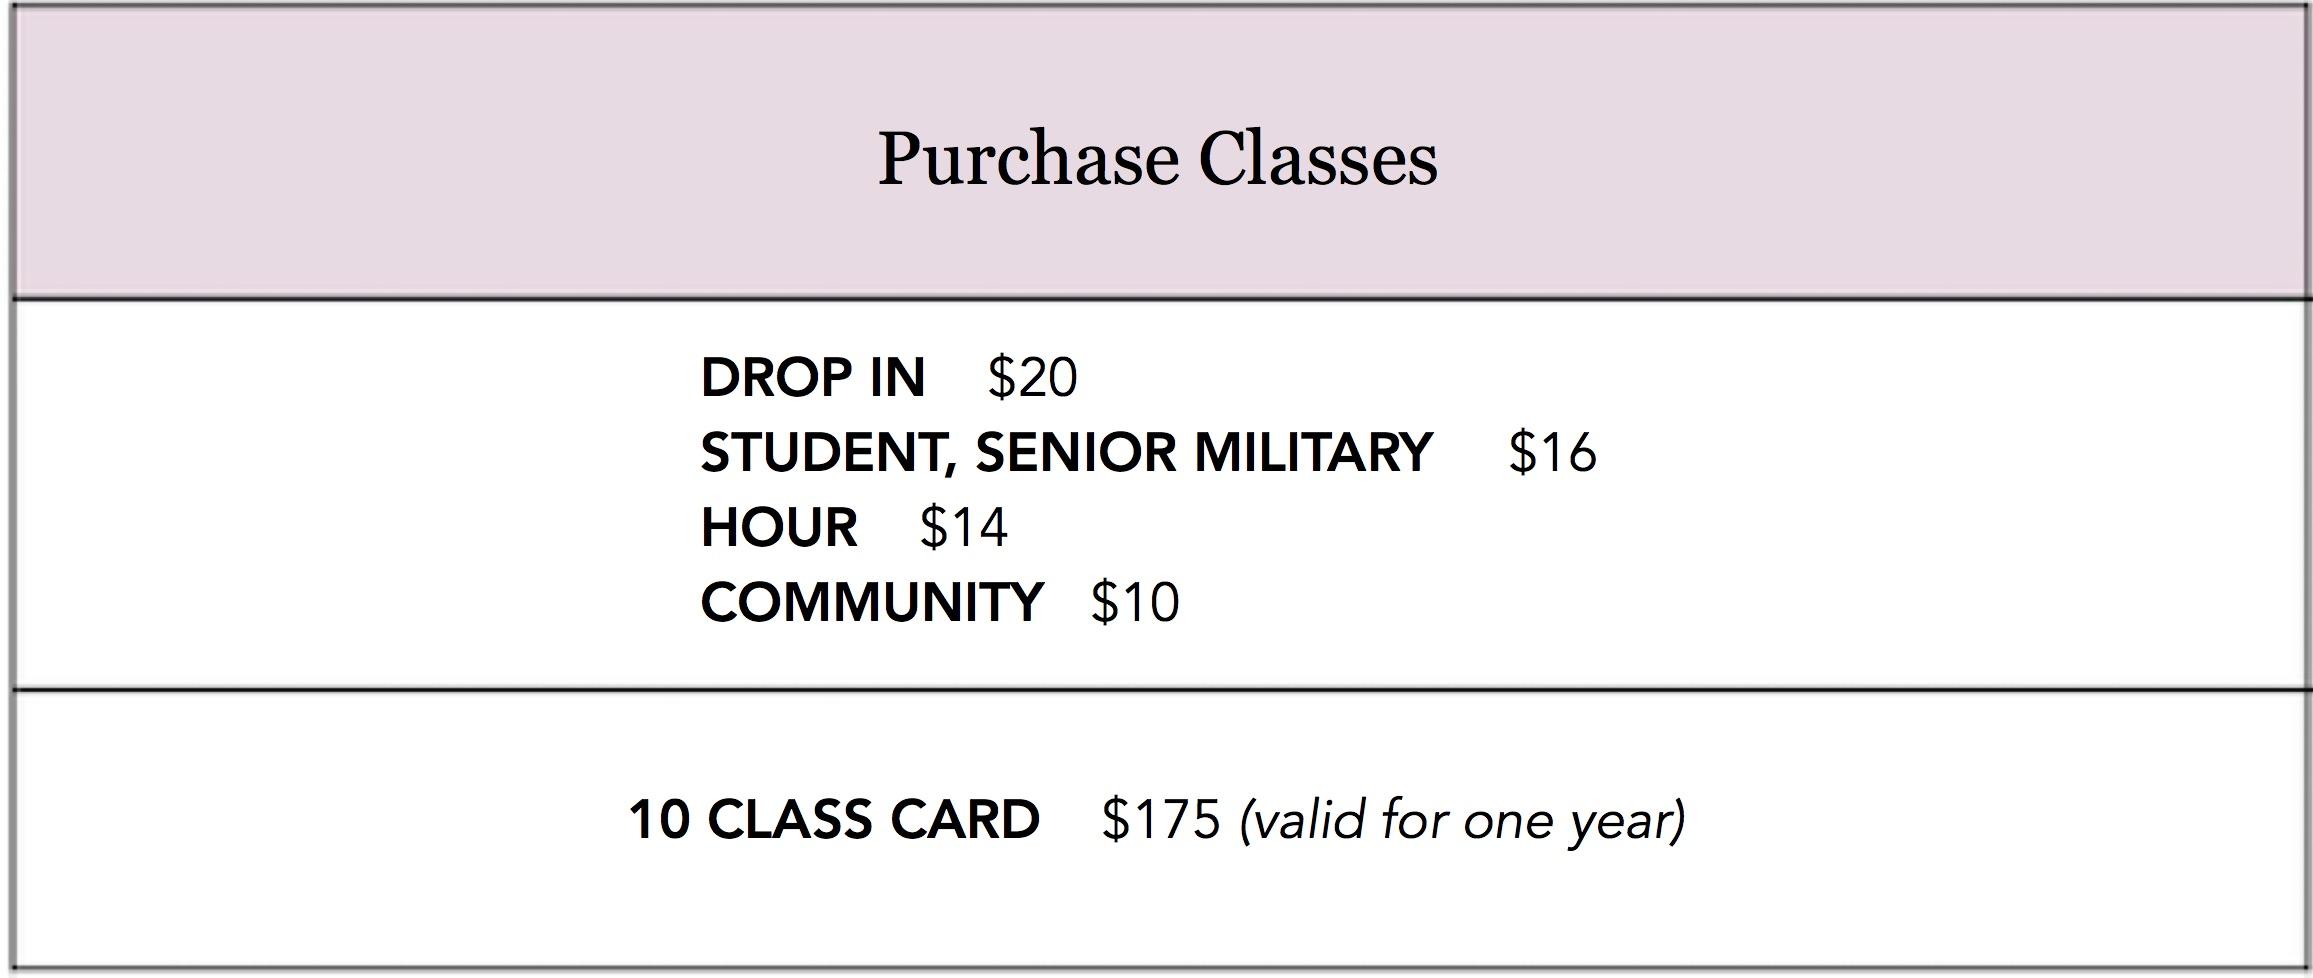 purchase classes.jpg